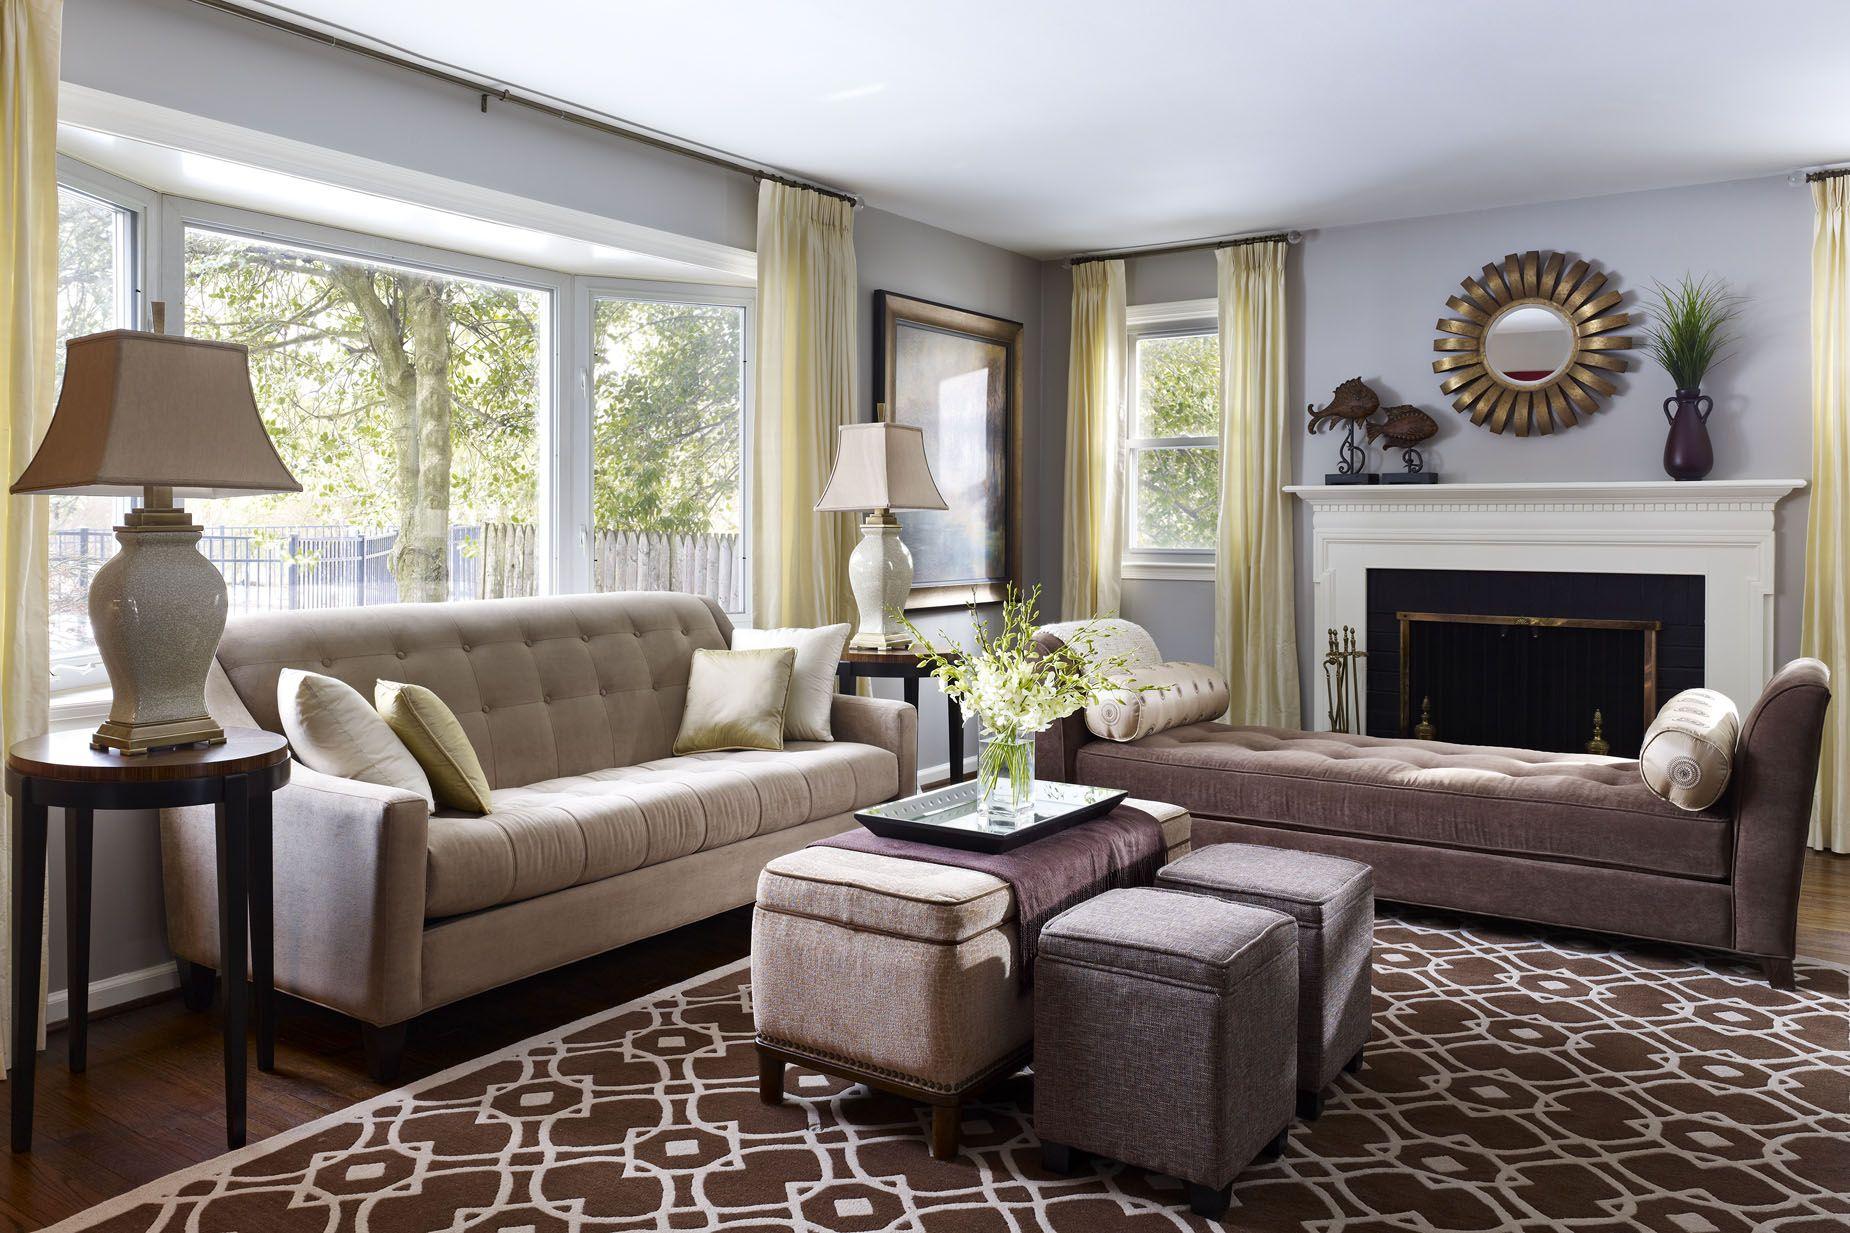 Transitional living room designs – 7 Design Ideas